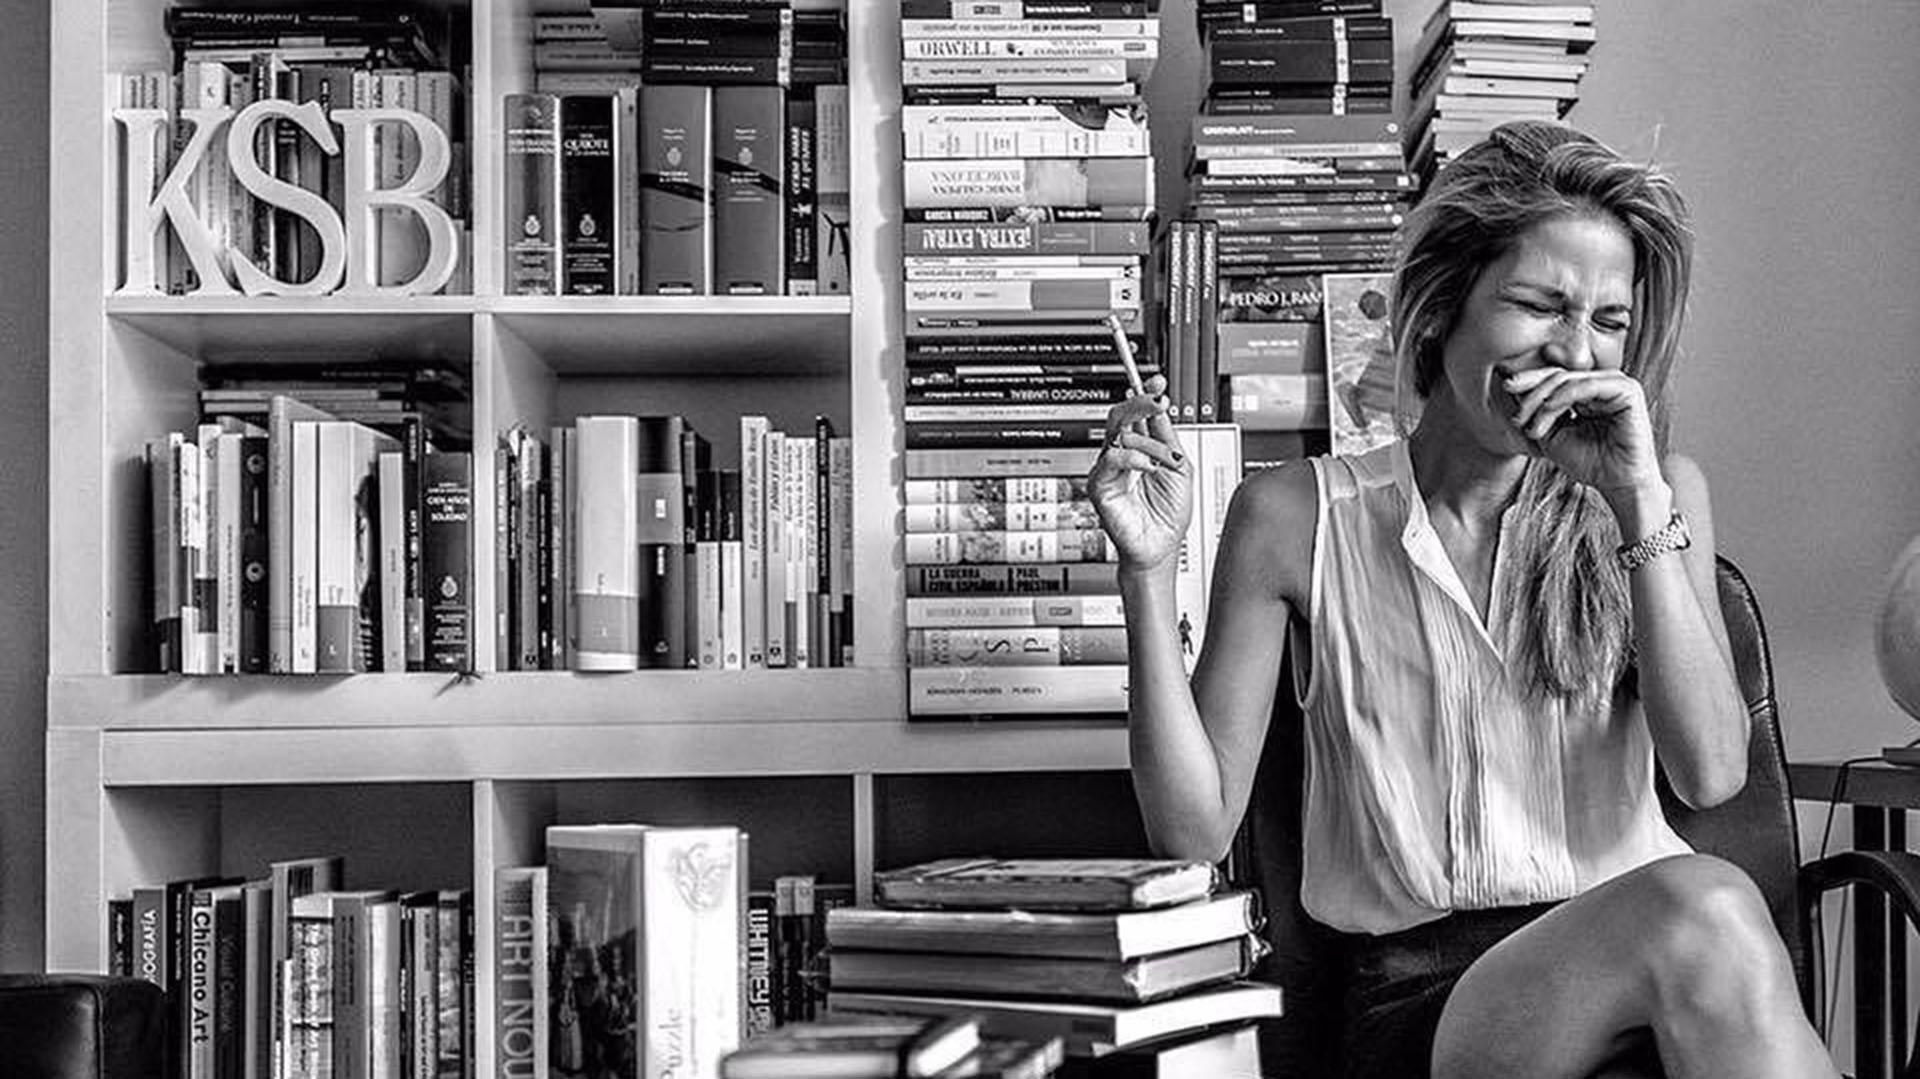 La novela de la escritora venezolana se convirtió en un fenómeno literario (@laksb)